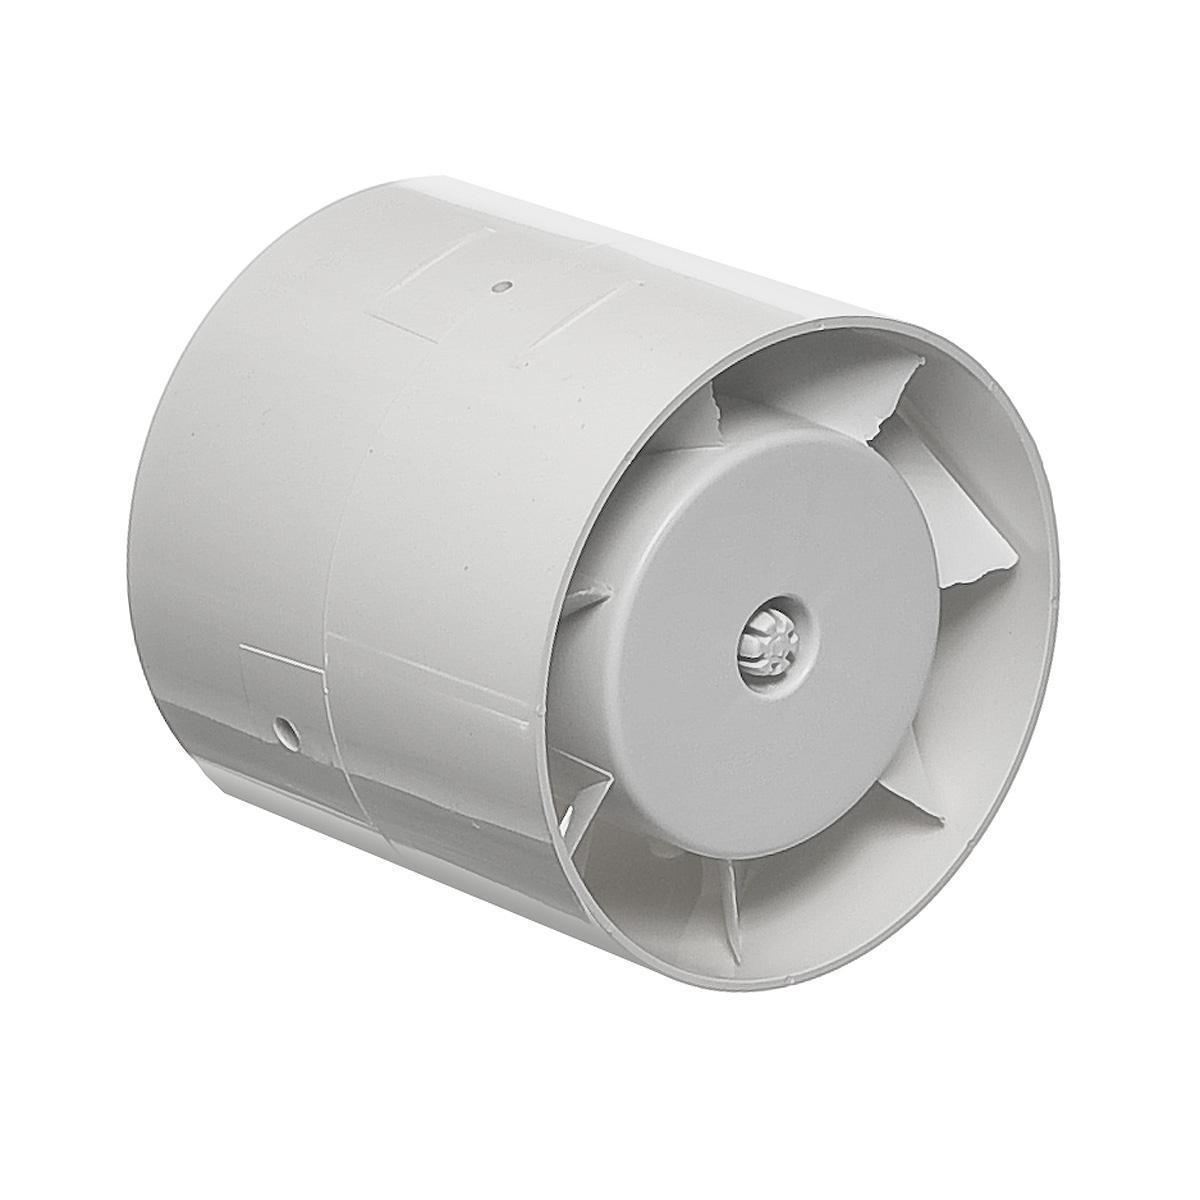 Cata Канальный вентилятор Cata MT-125 0edb0-5a07-11e1-bfea-00259036a114_2000x0_1.JPG